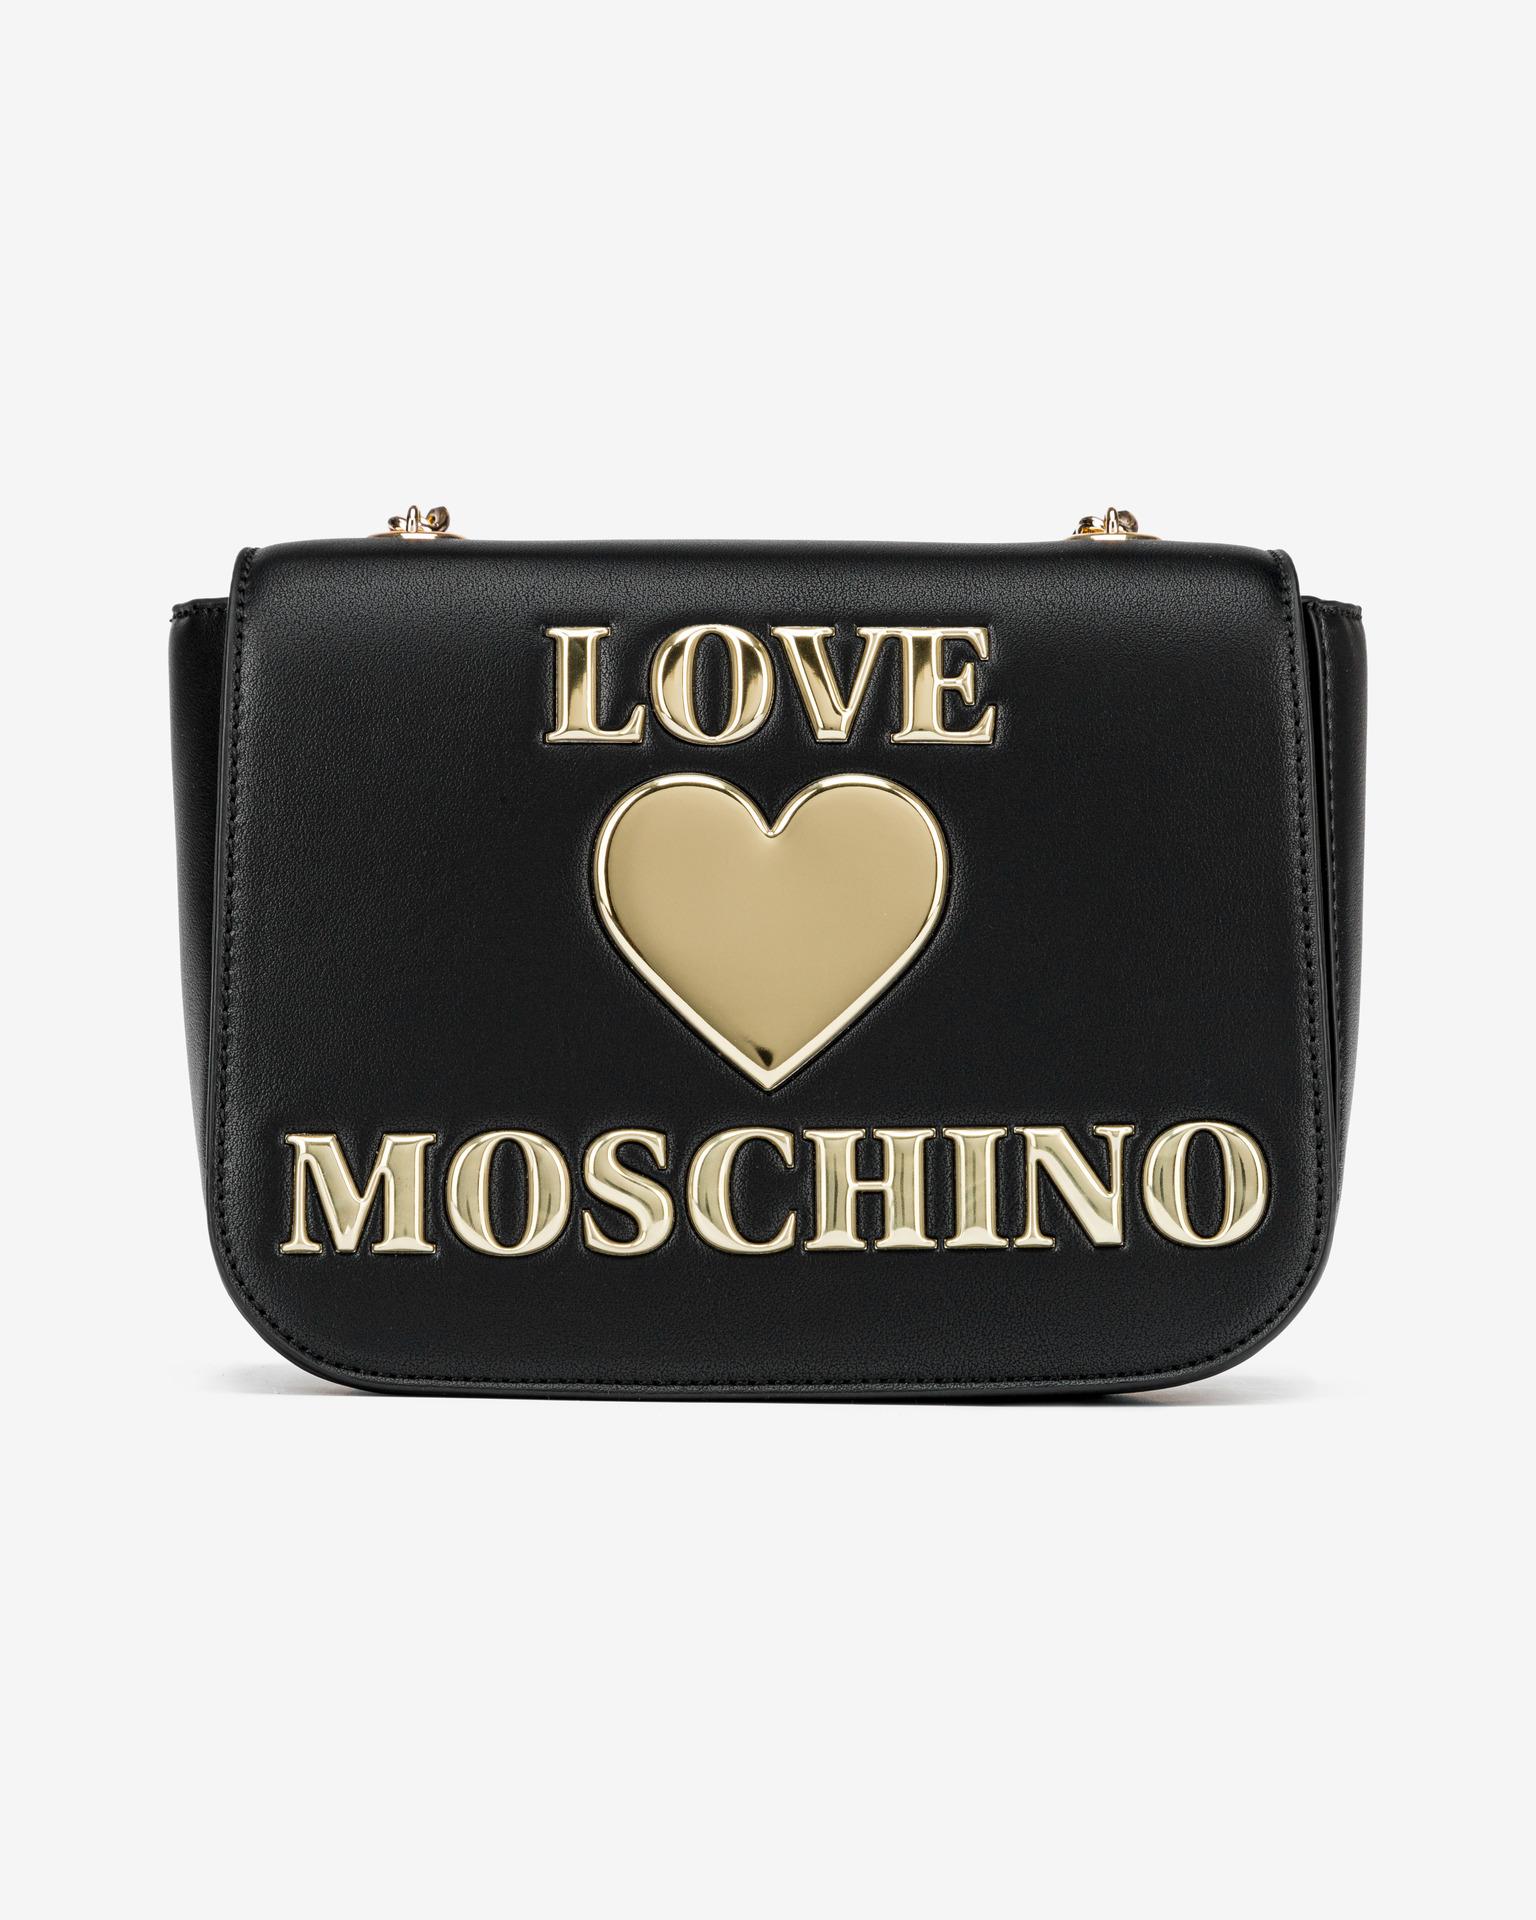 Love Moschino fekete crossbody kézitáska